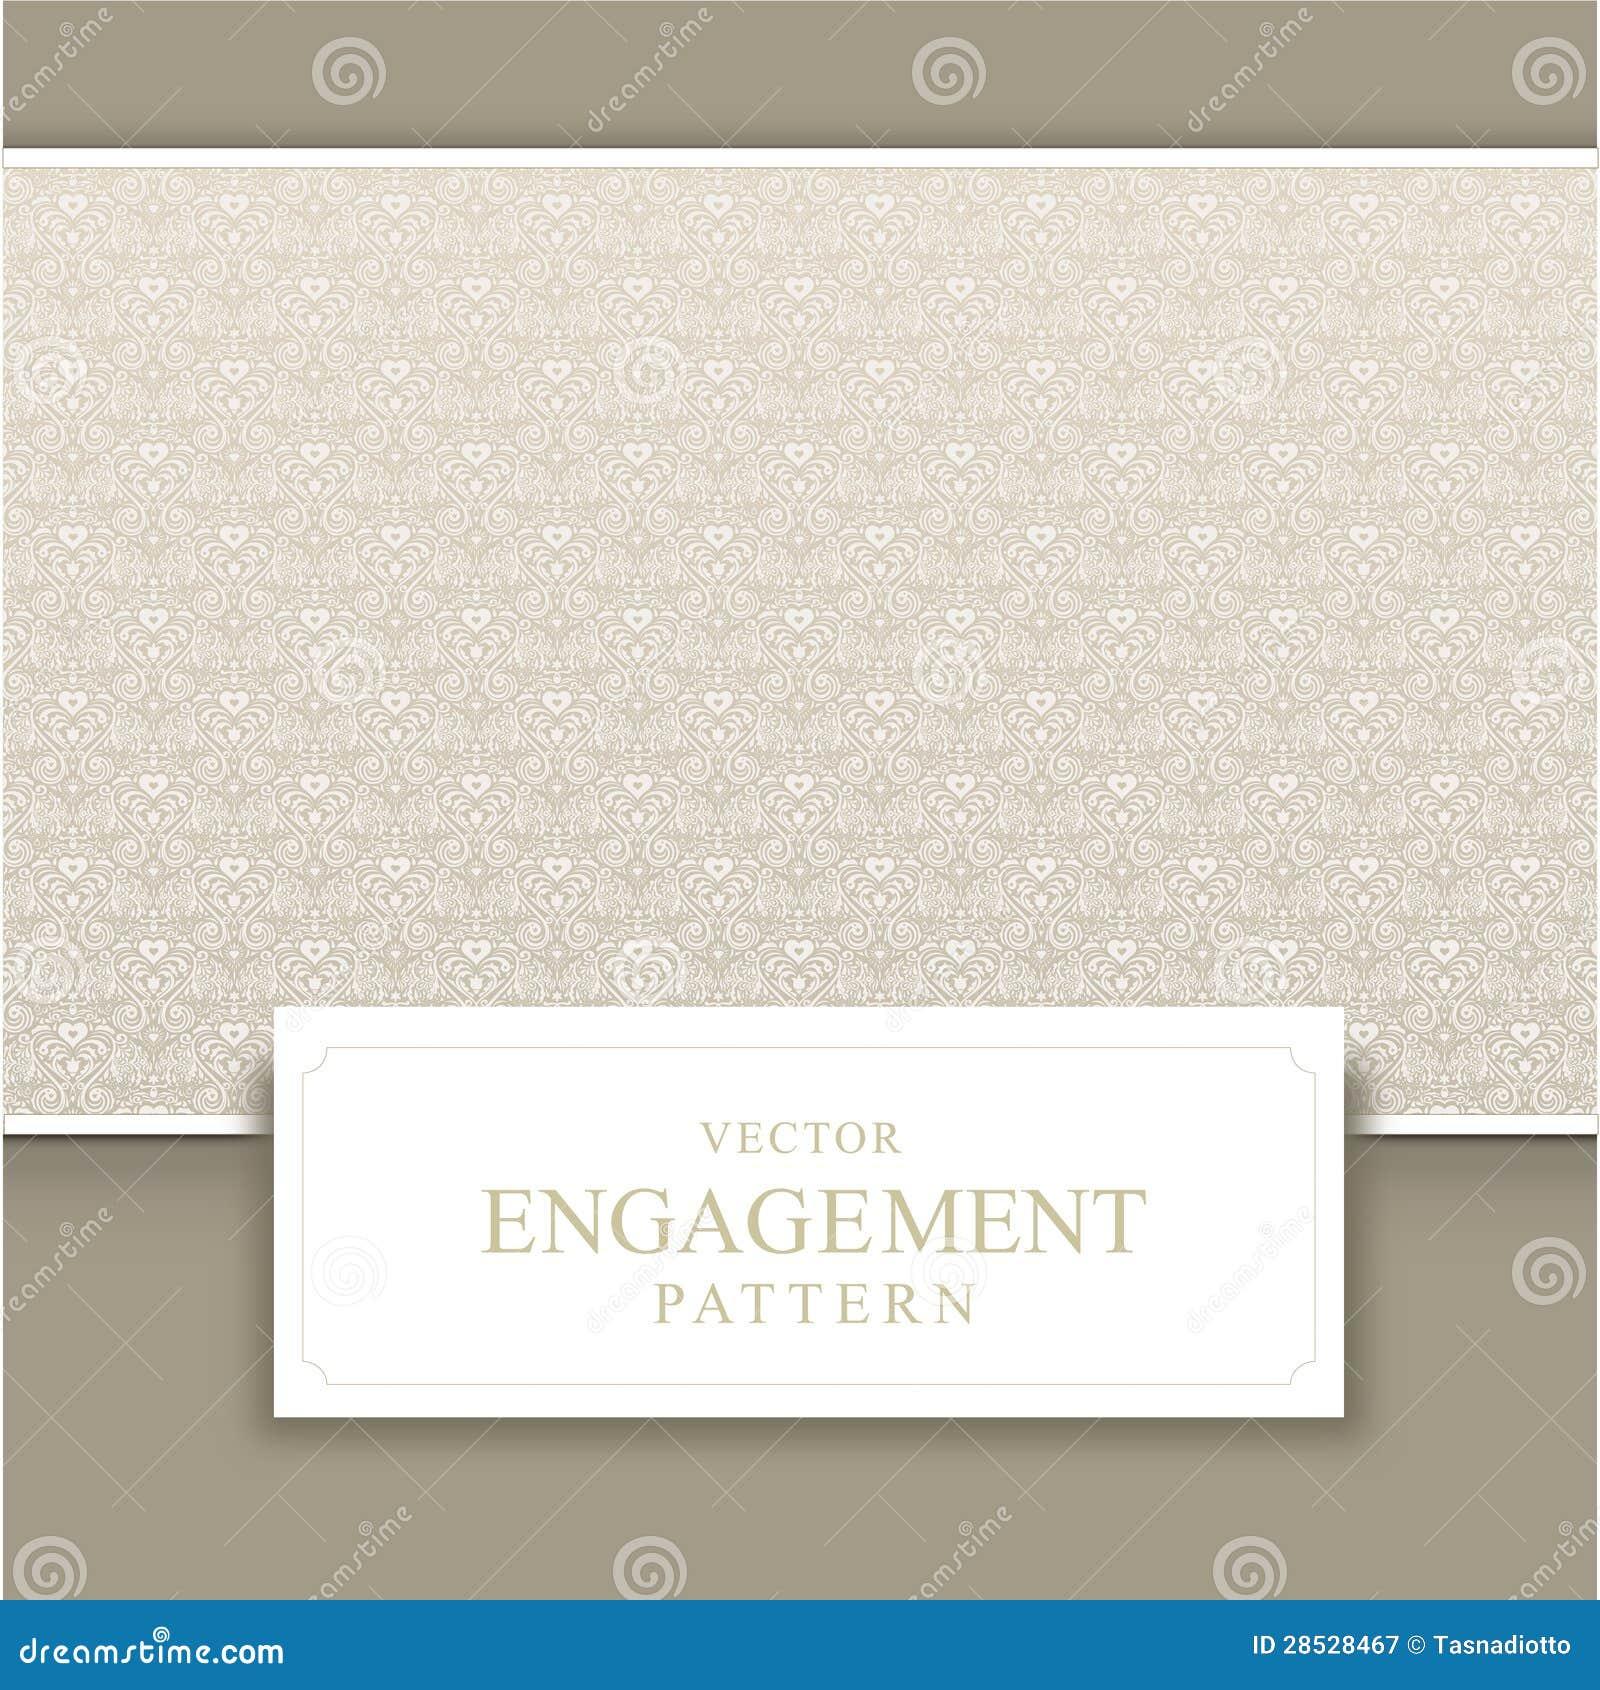 Engagement invitation card stock illustration illustration of engagement invitation card royalty free stock photo stopboris Choice Image